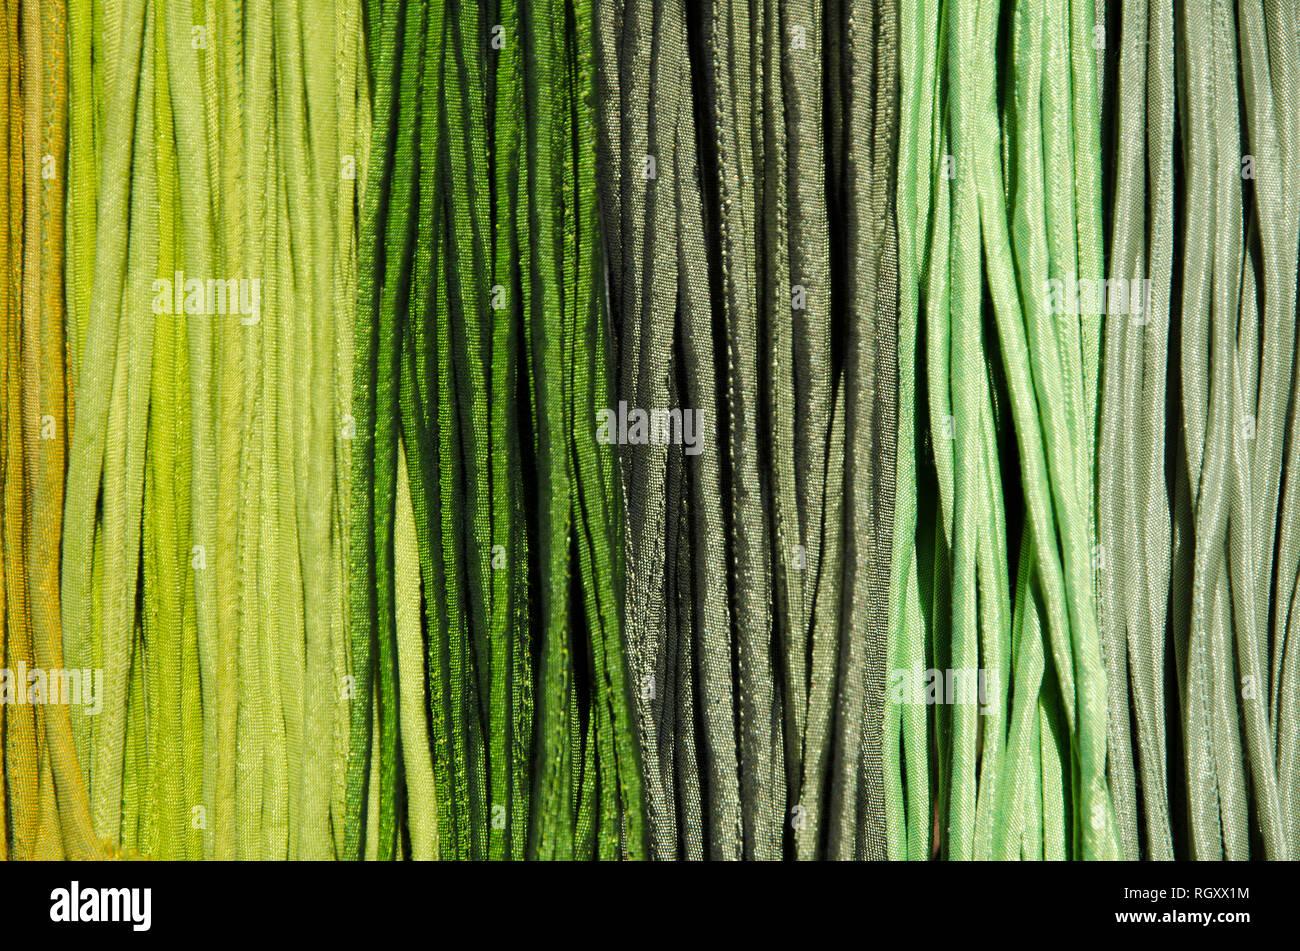 Multi-Colored Striped Fabrics. - Stock Image